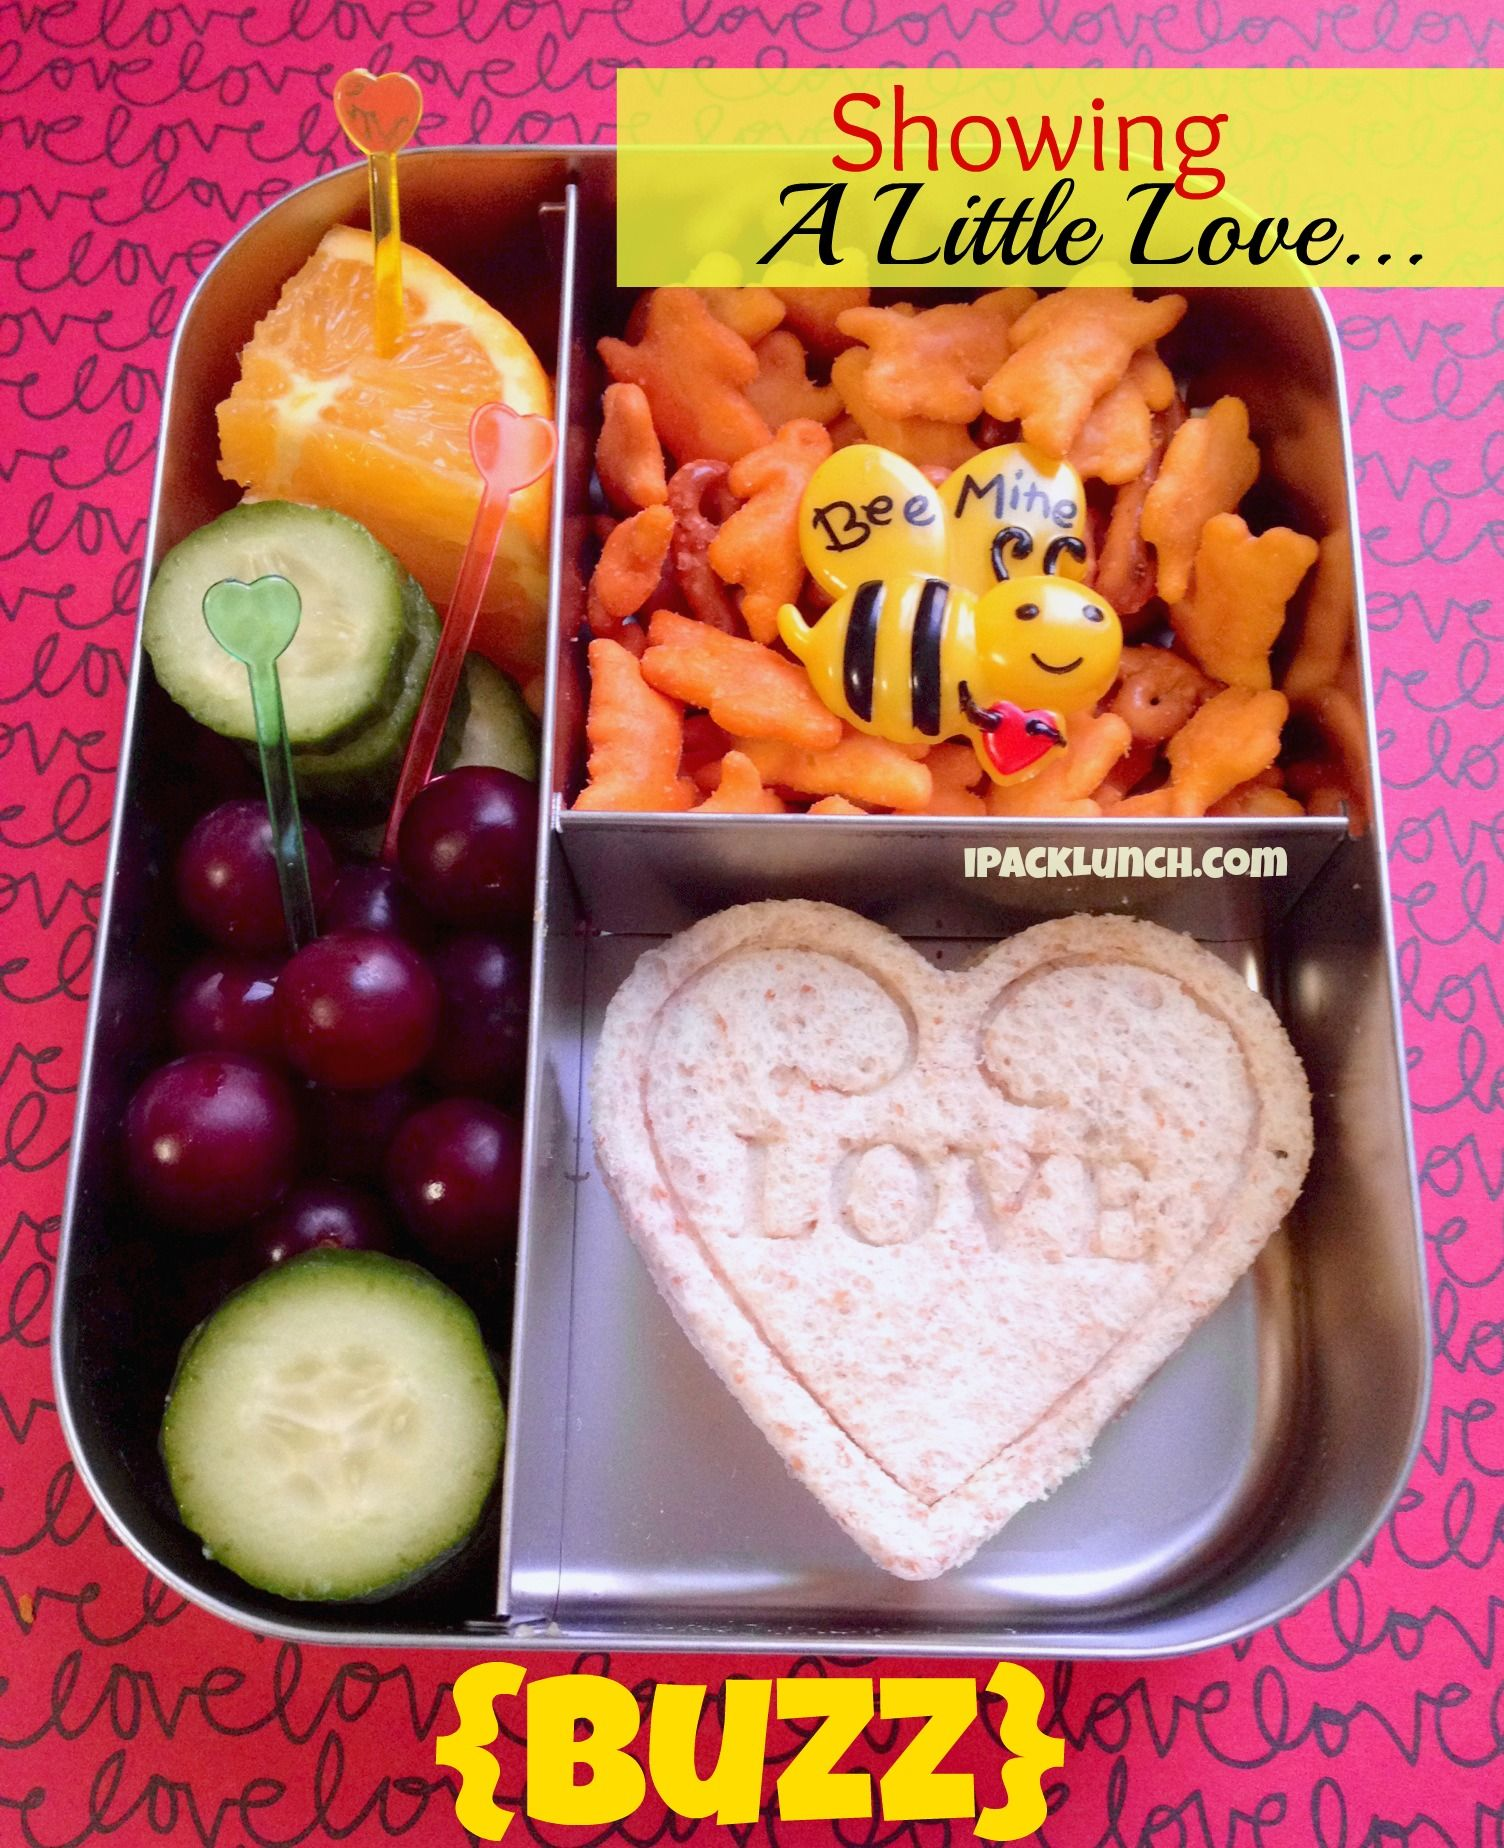 Valentine's bee mine bento lunch box